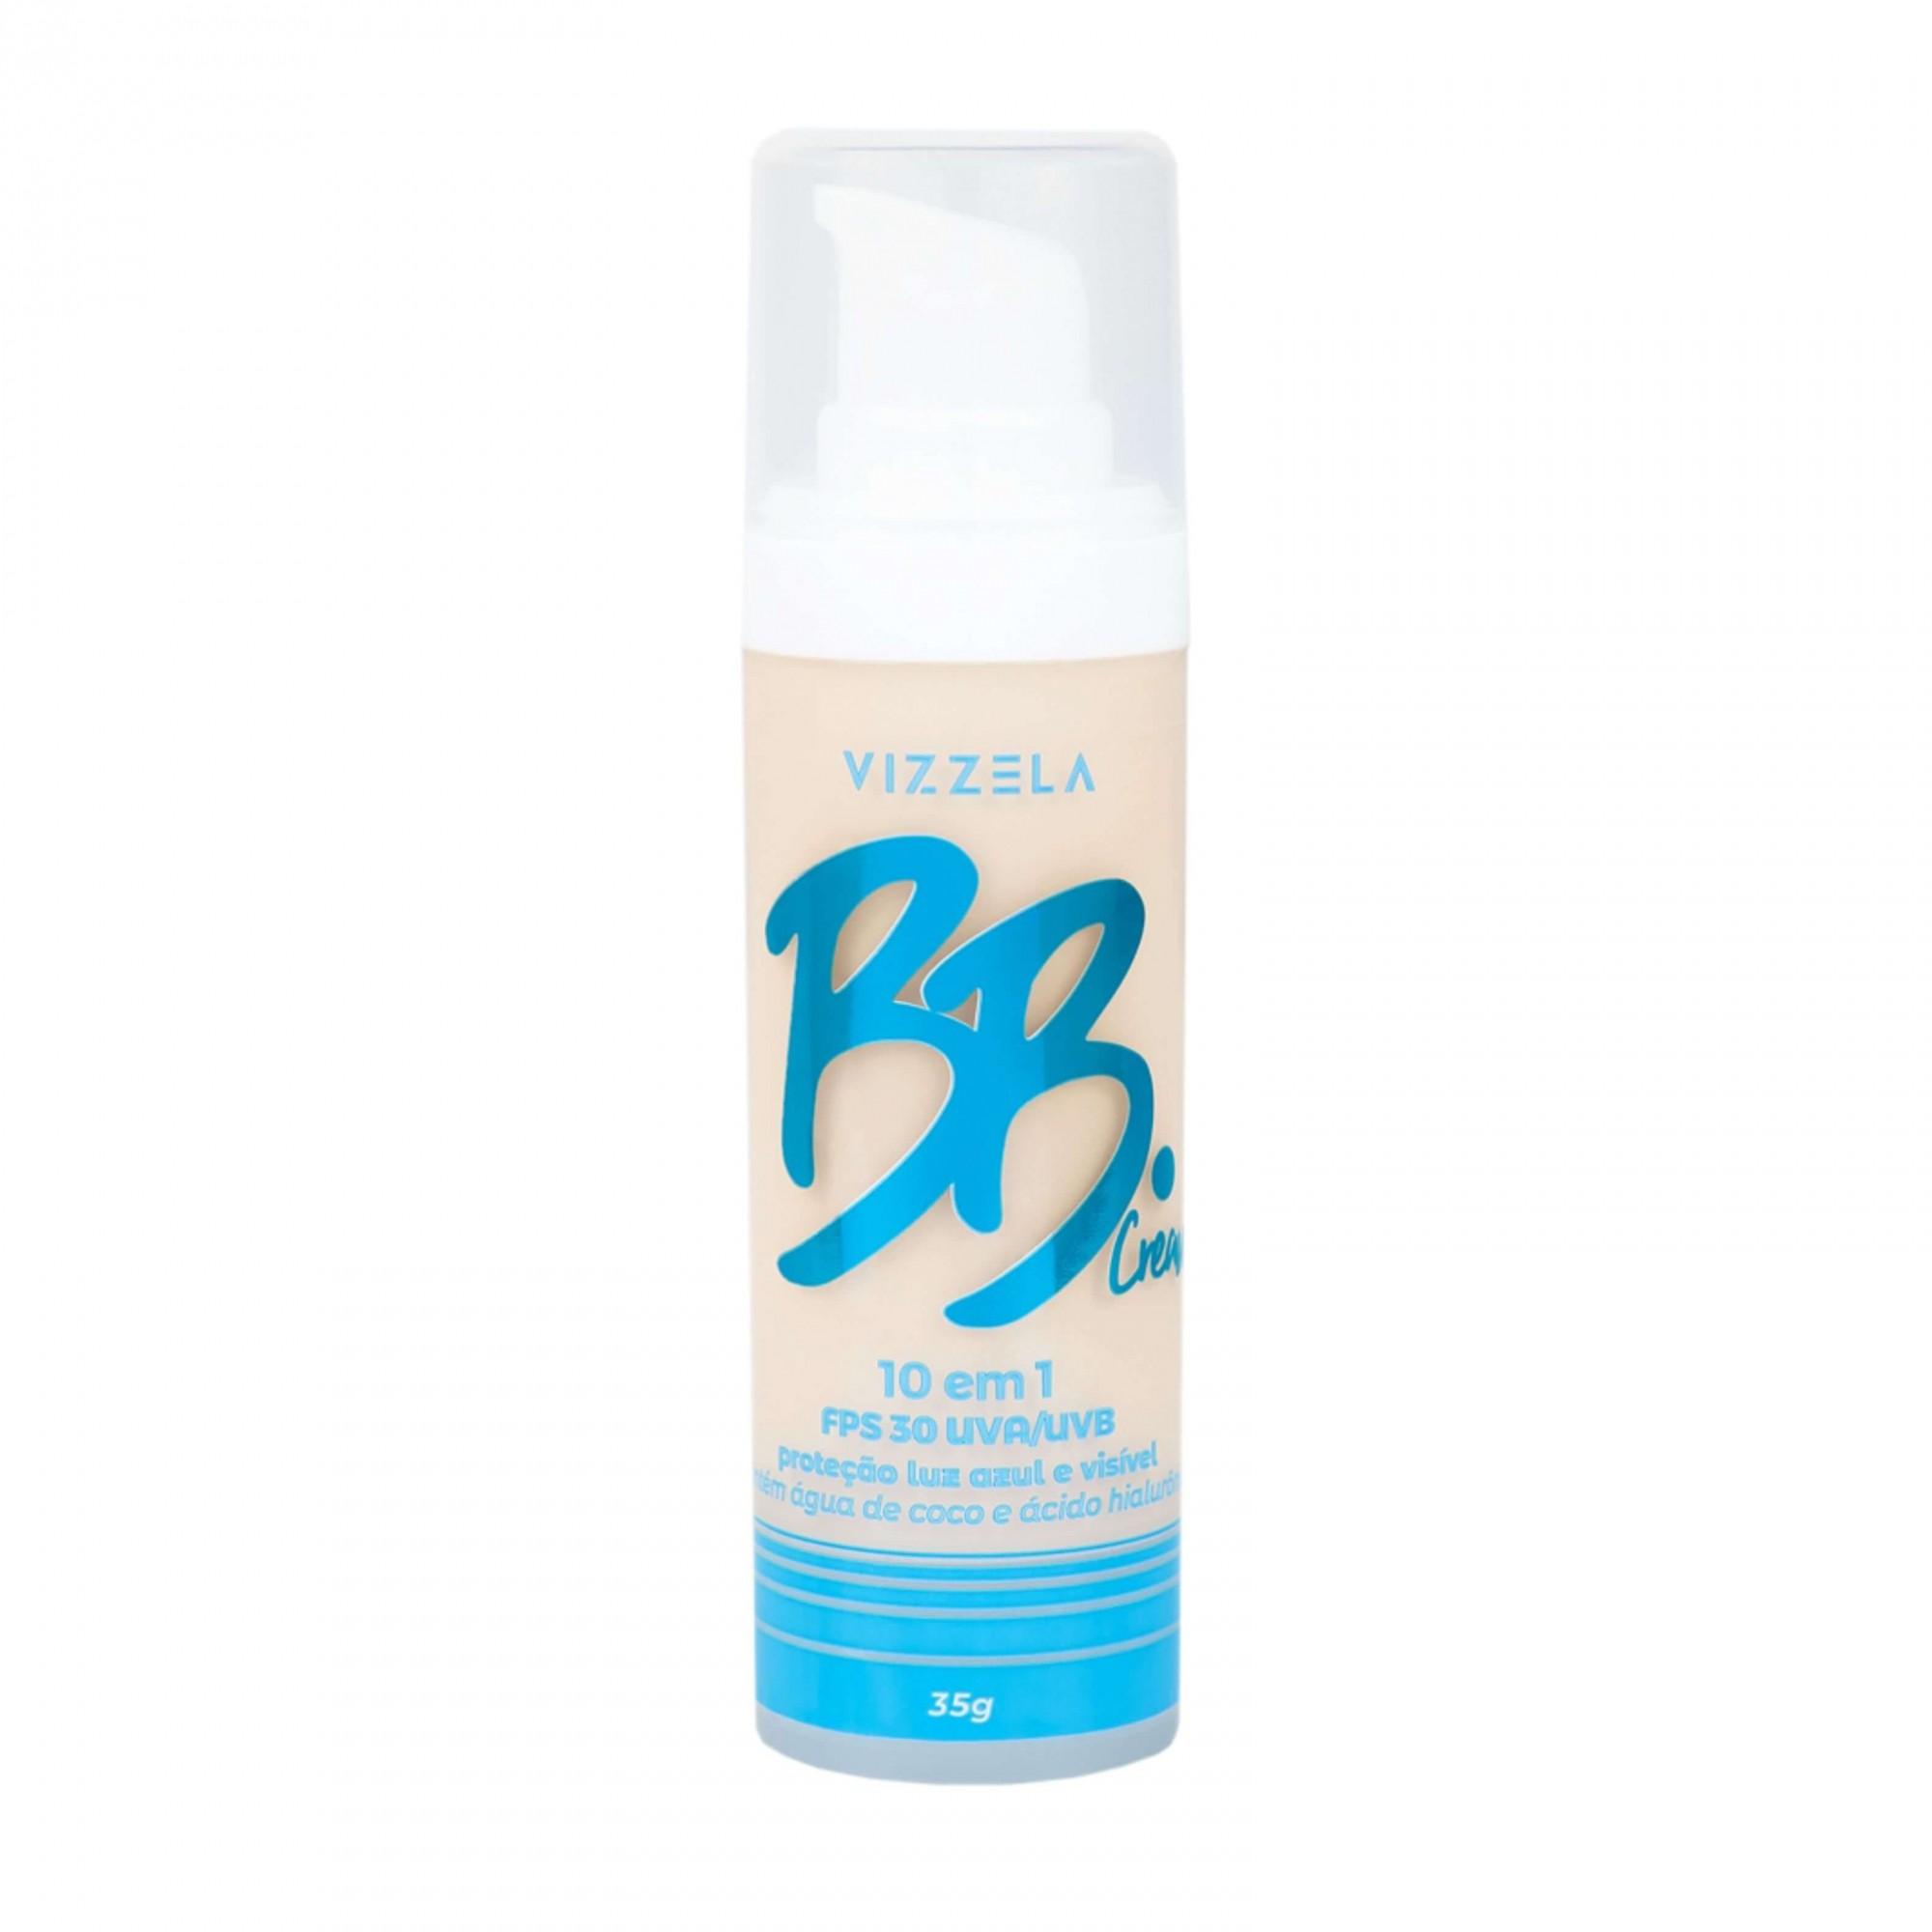 BB Cream FPS30 Vizzela Cosméticos cor 00